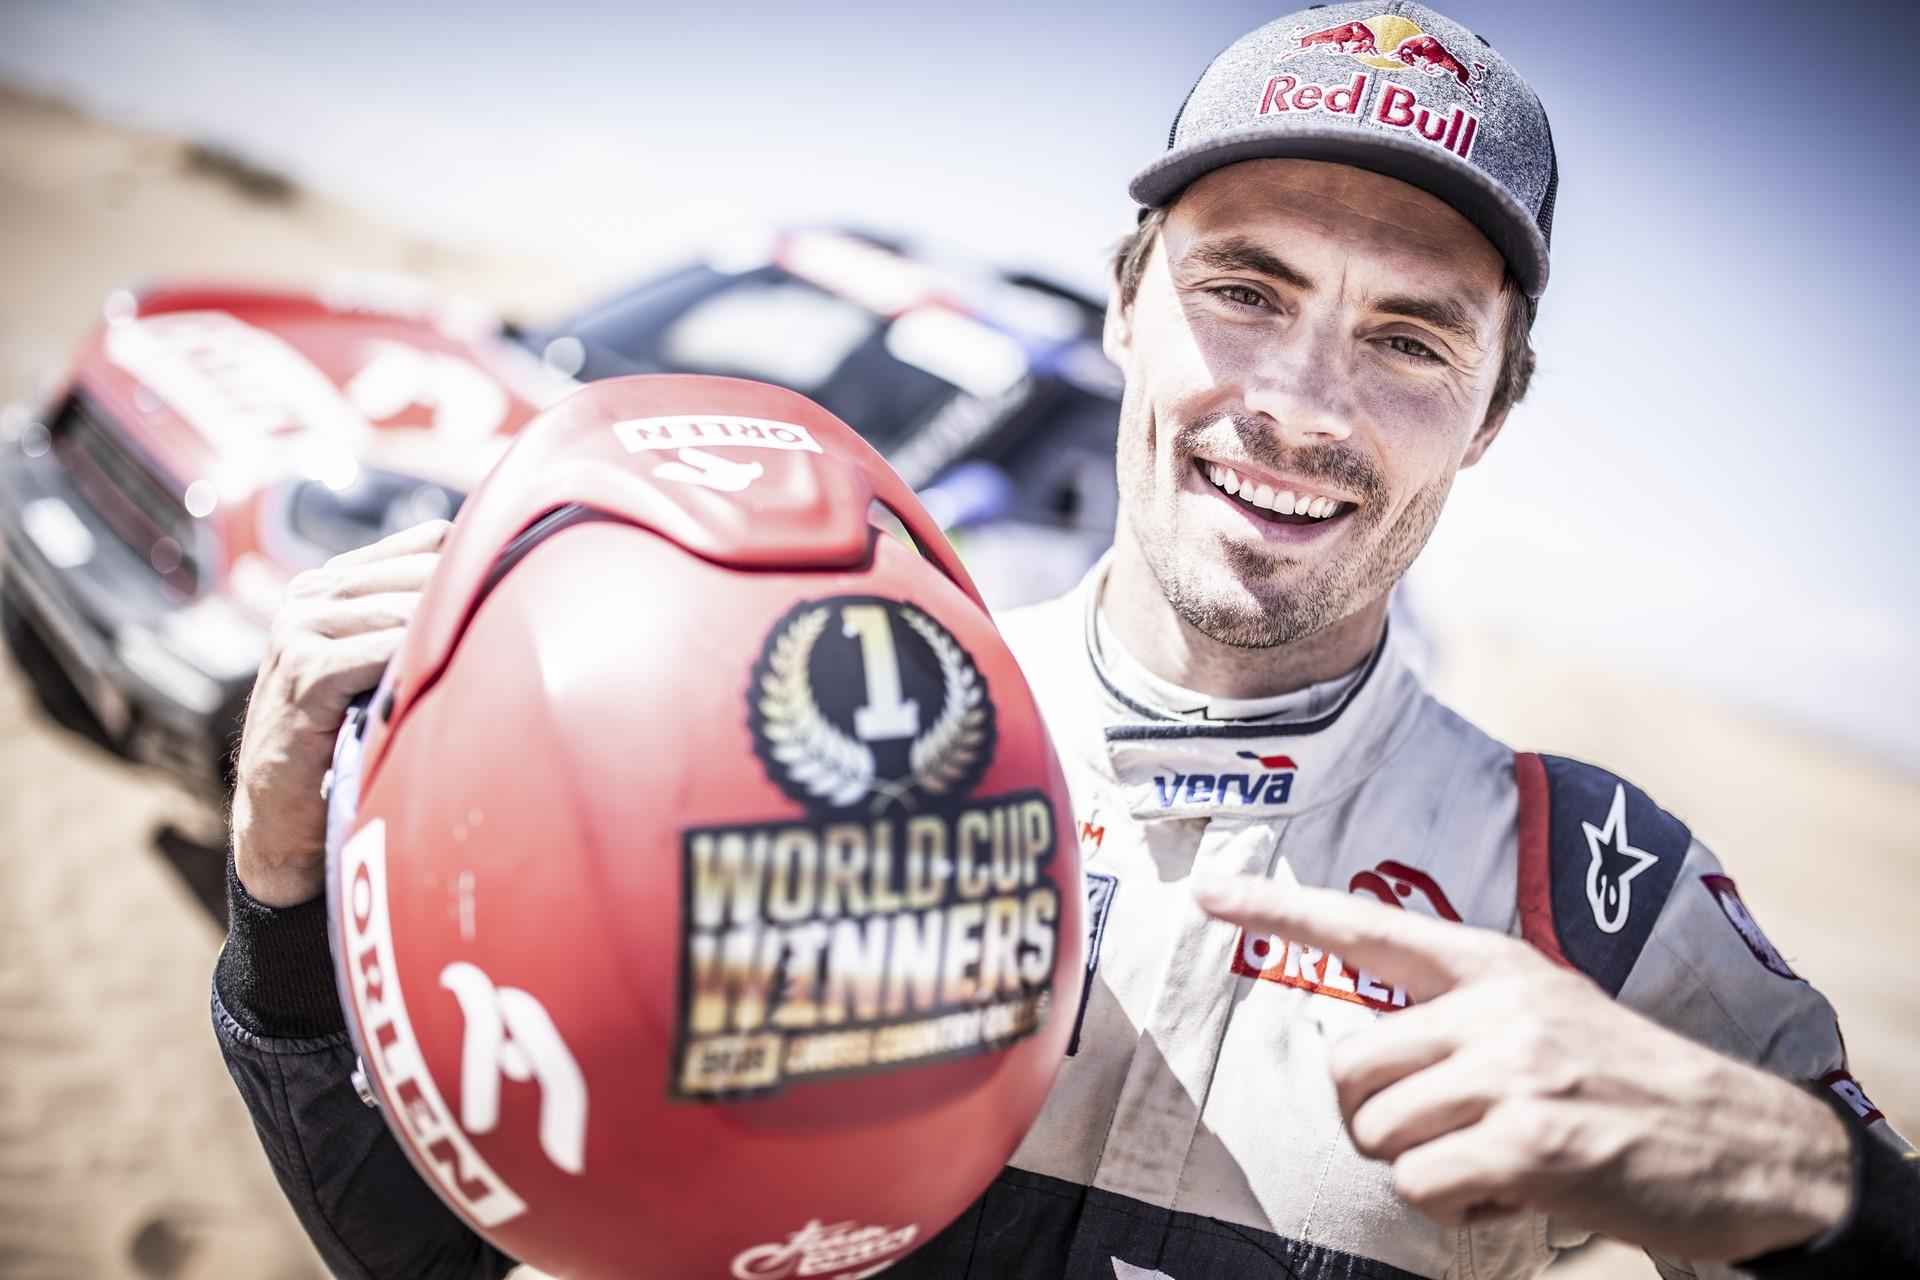 Jakub Przykonski becoms the new world champion, Rally Du Maroc in Erfoud, Morocco on October 08, 2018